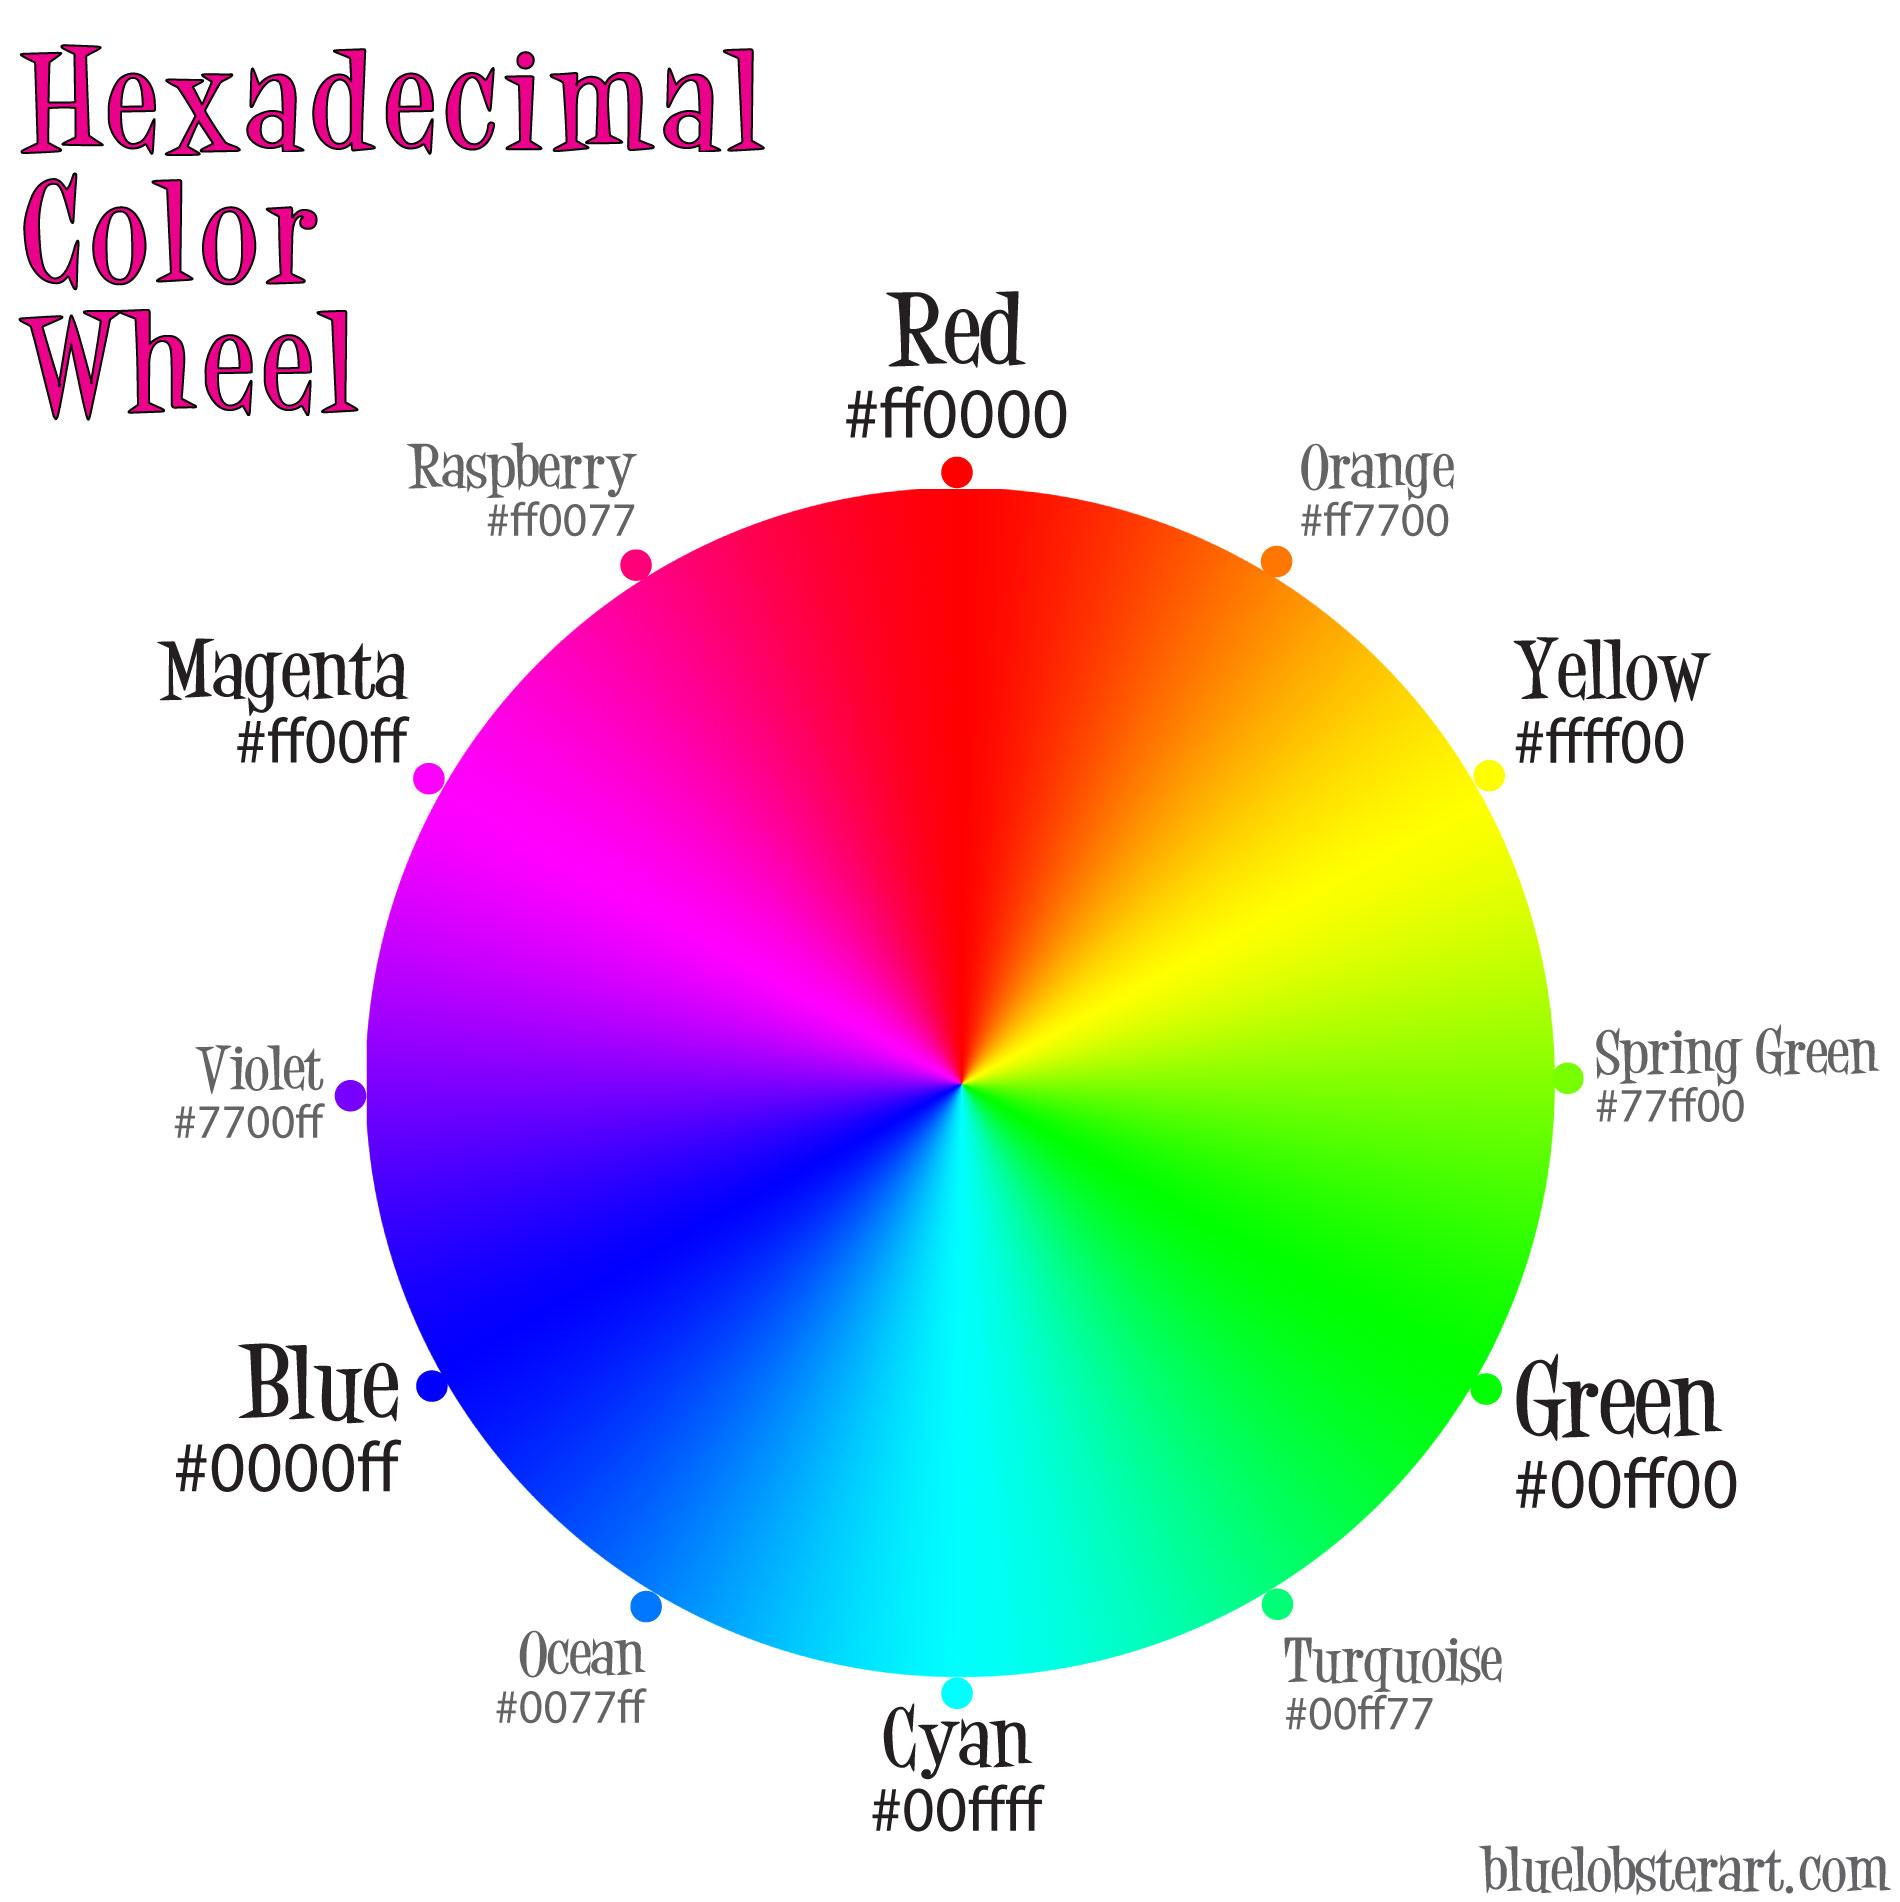 The Hexadecimal Color Wheel